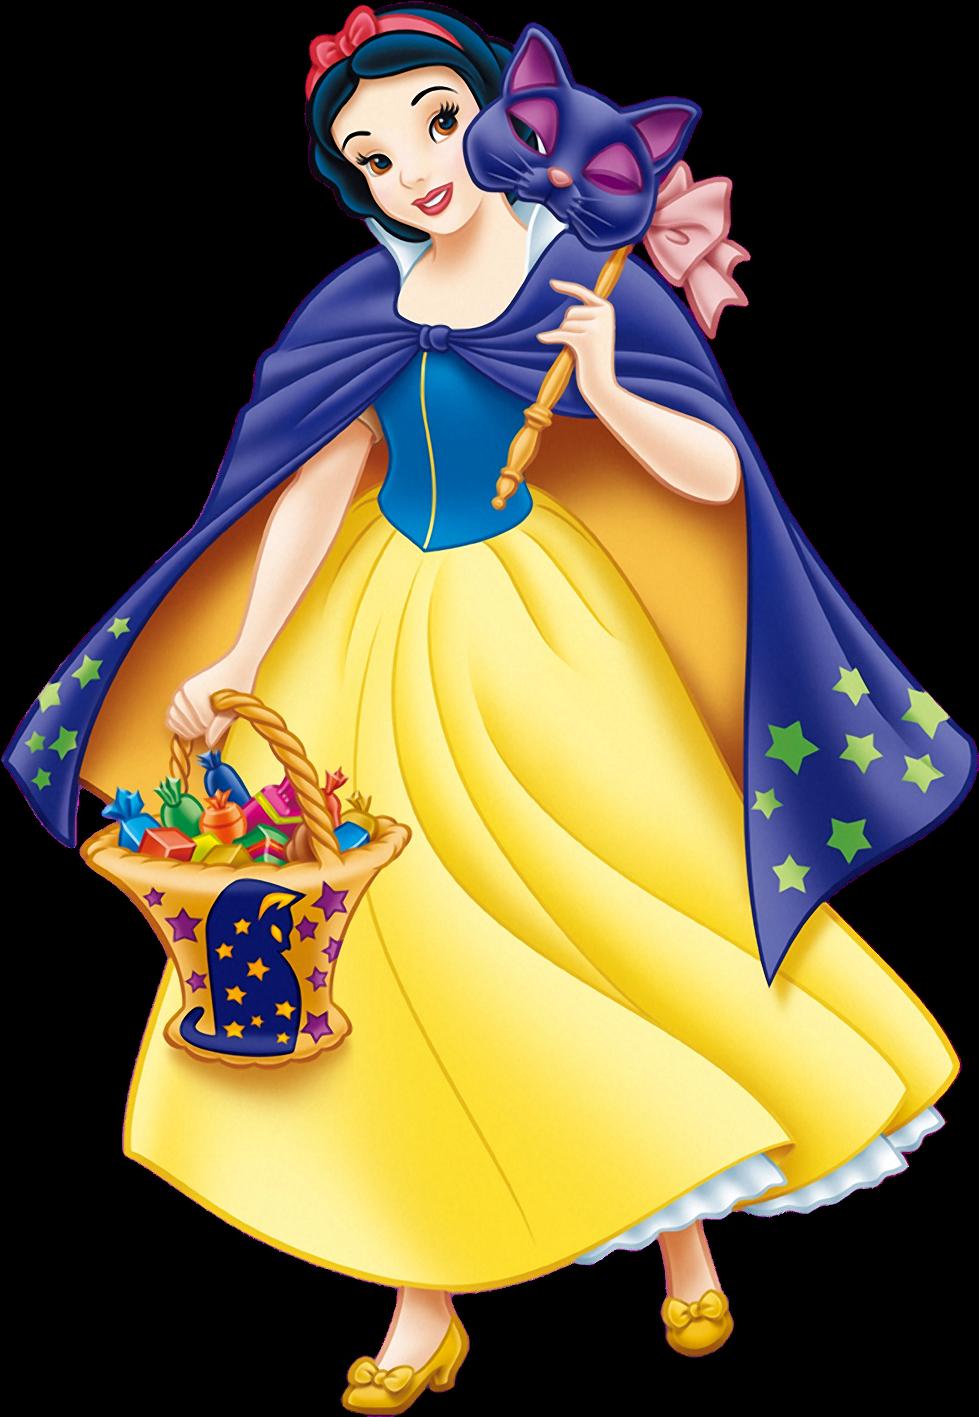 clipart princesas disney - photo #37